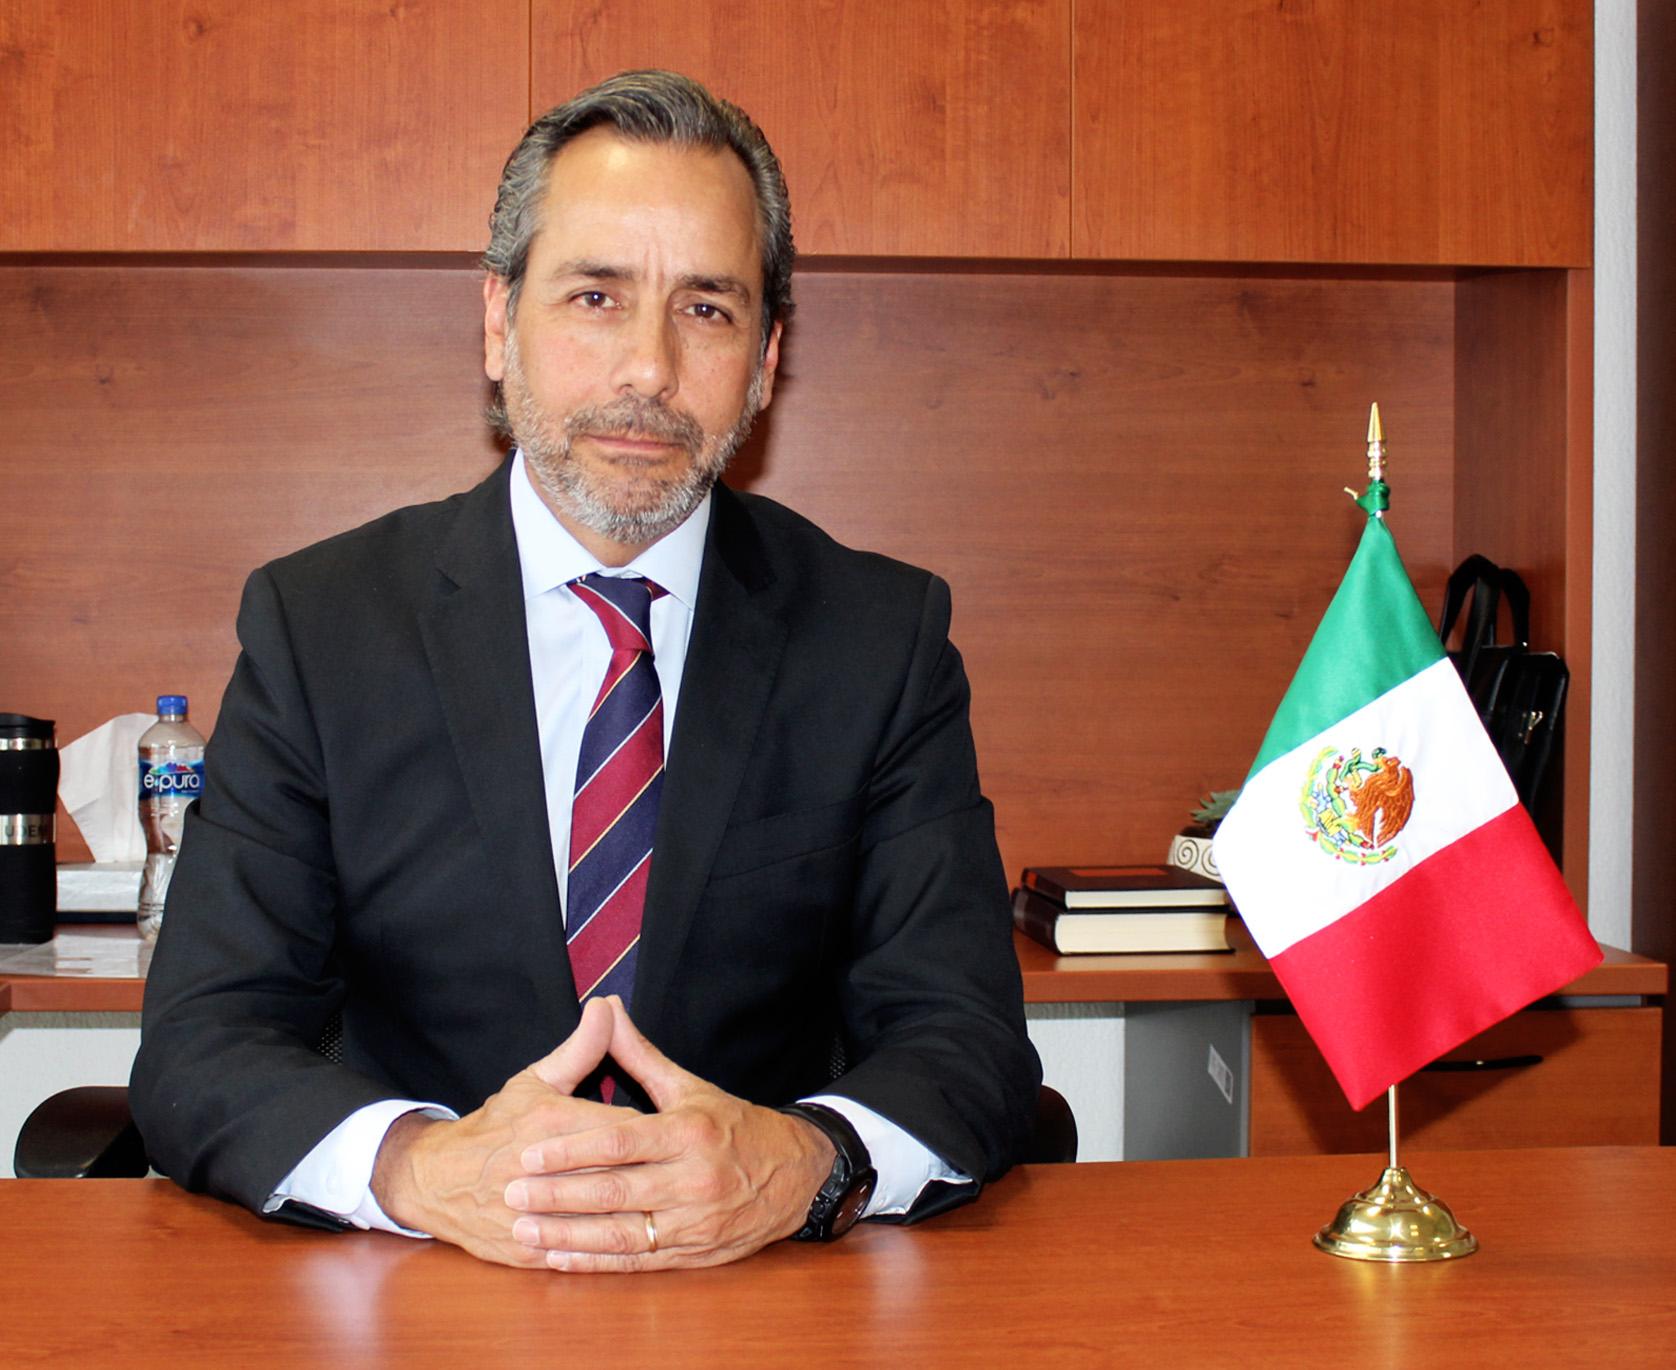 Ricardo Jesús Sepúlveda Iguiniz